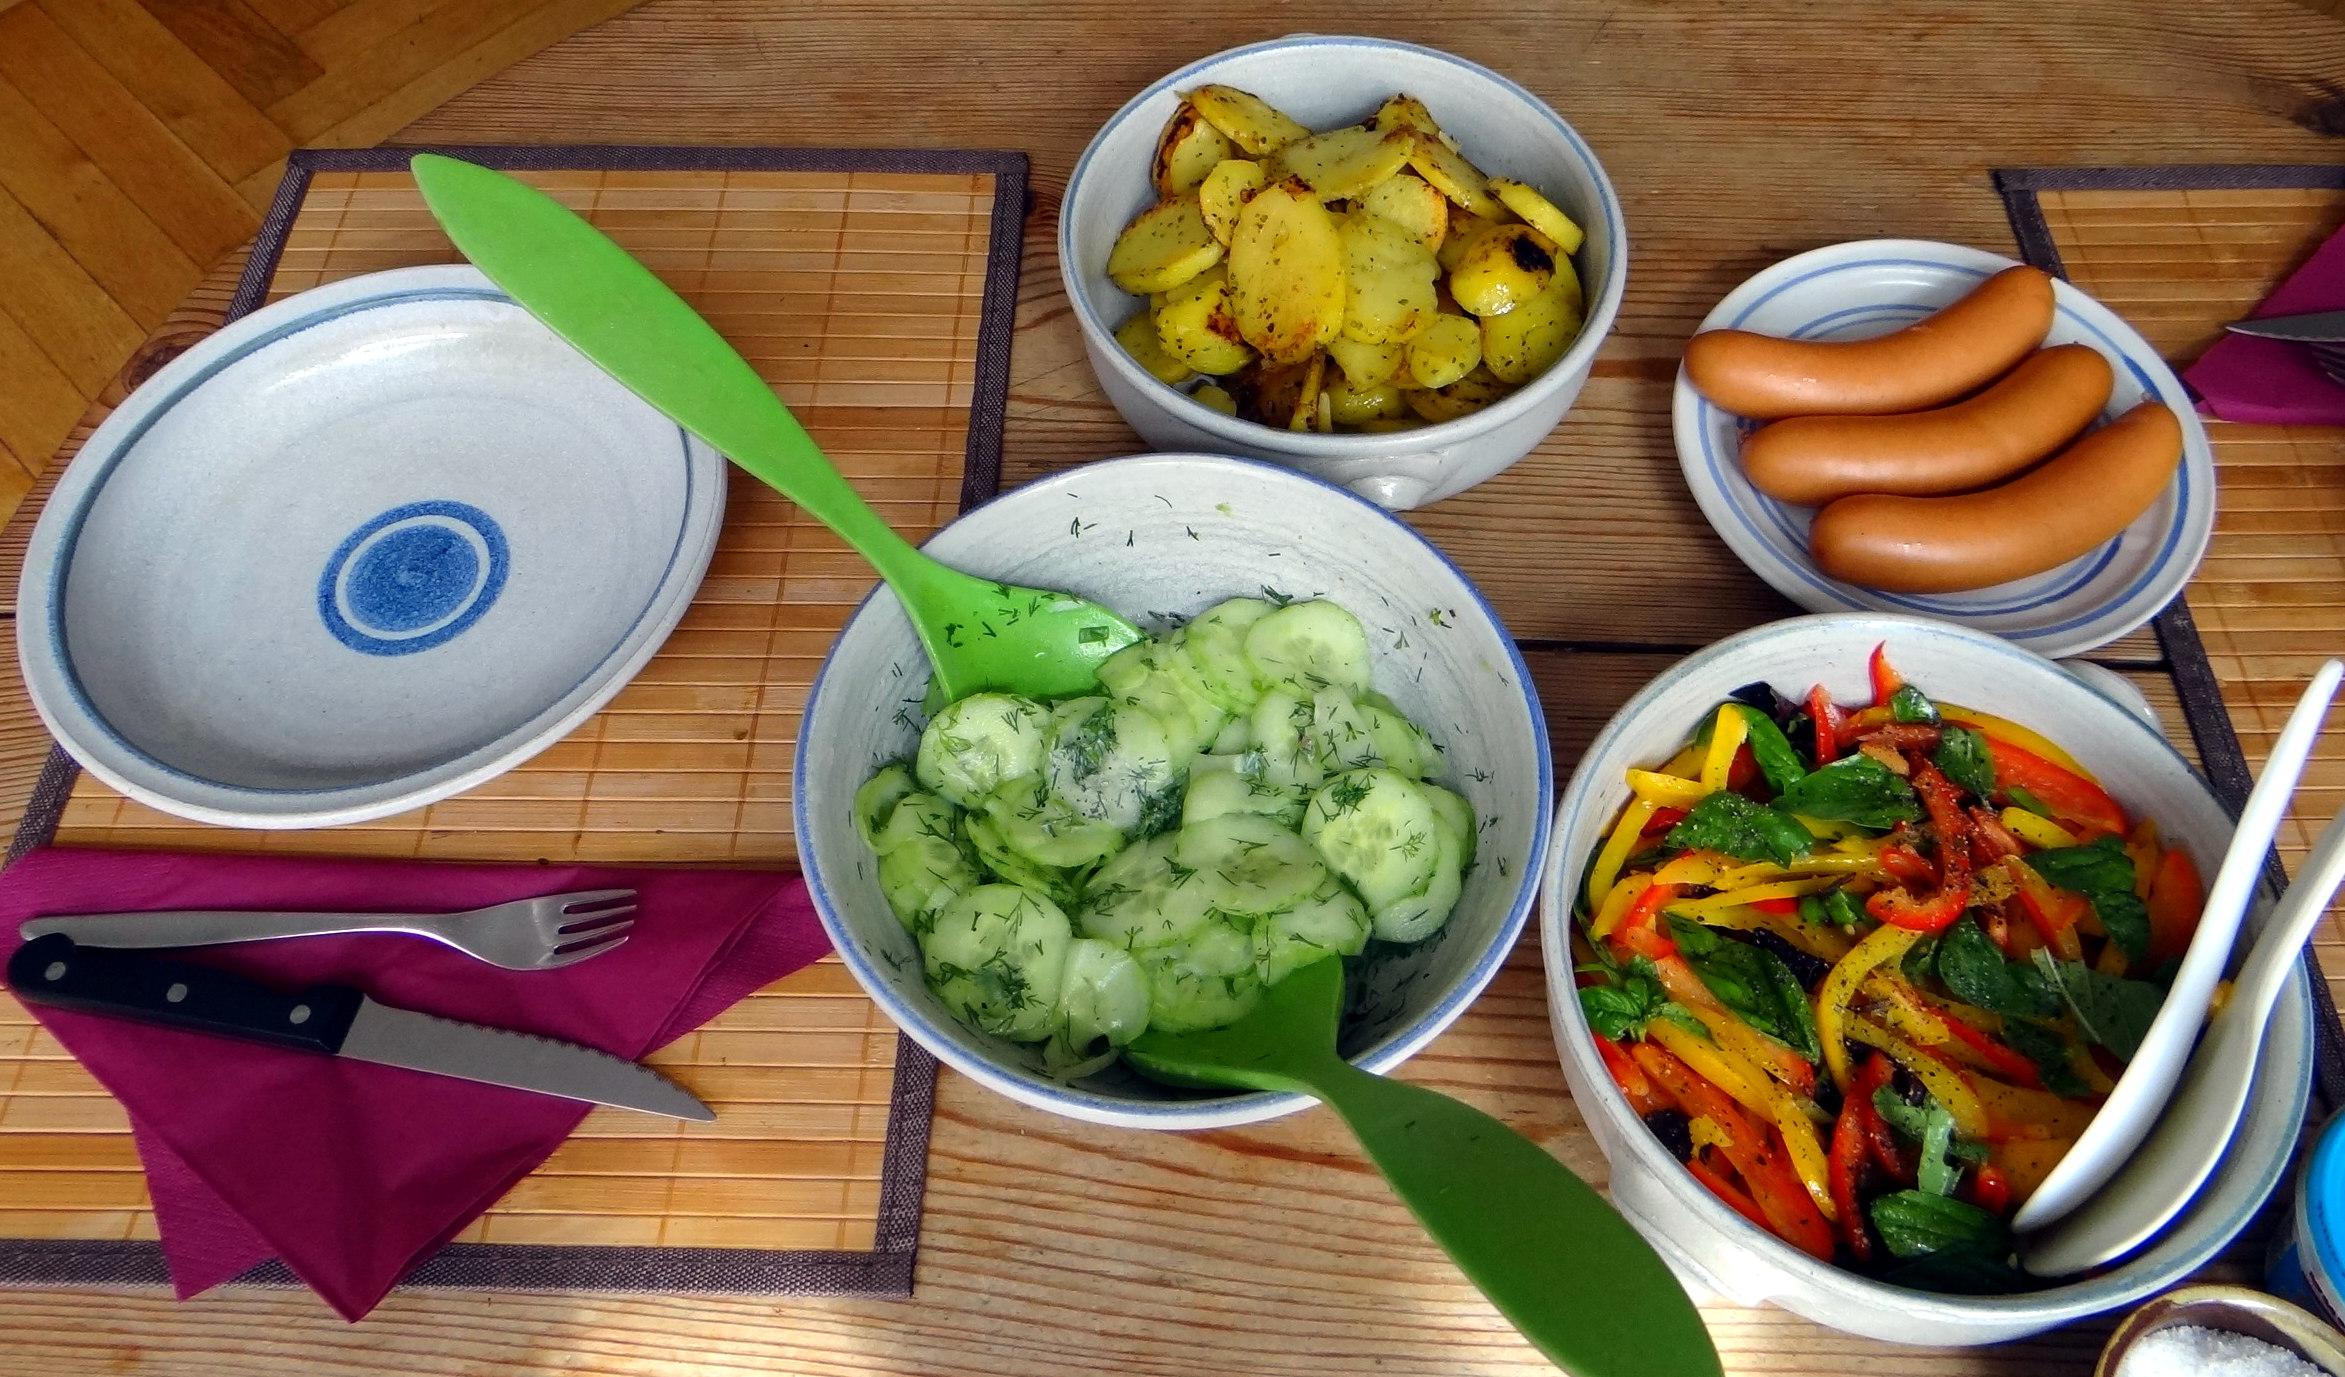 Bratkartoffel,Bockwurst,Salate (11)